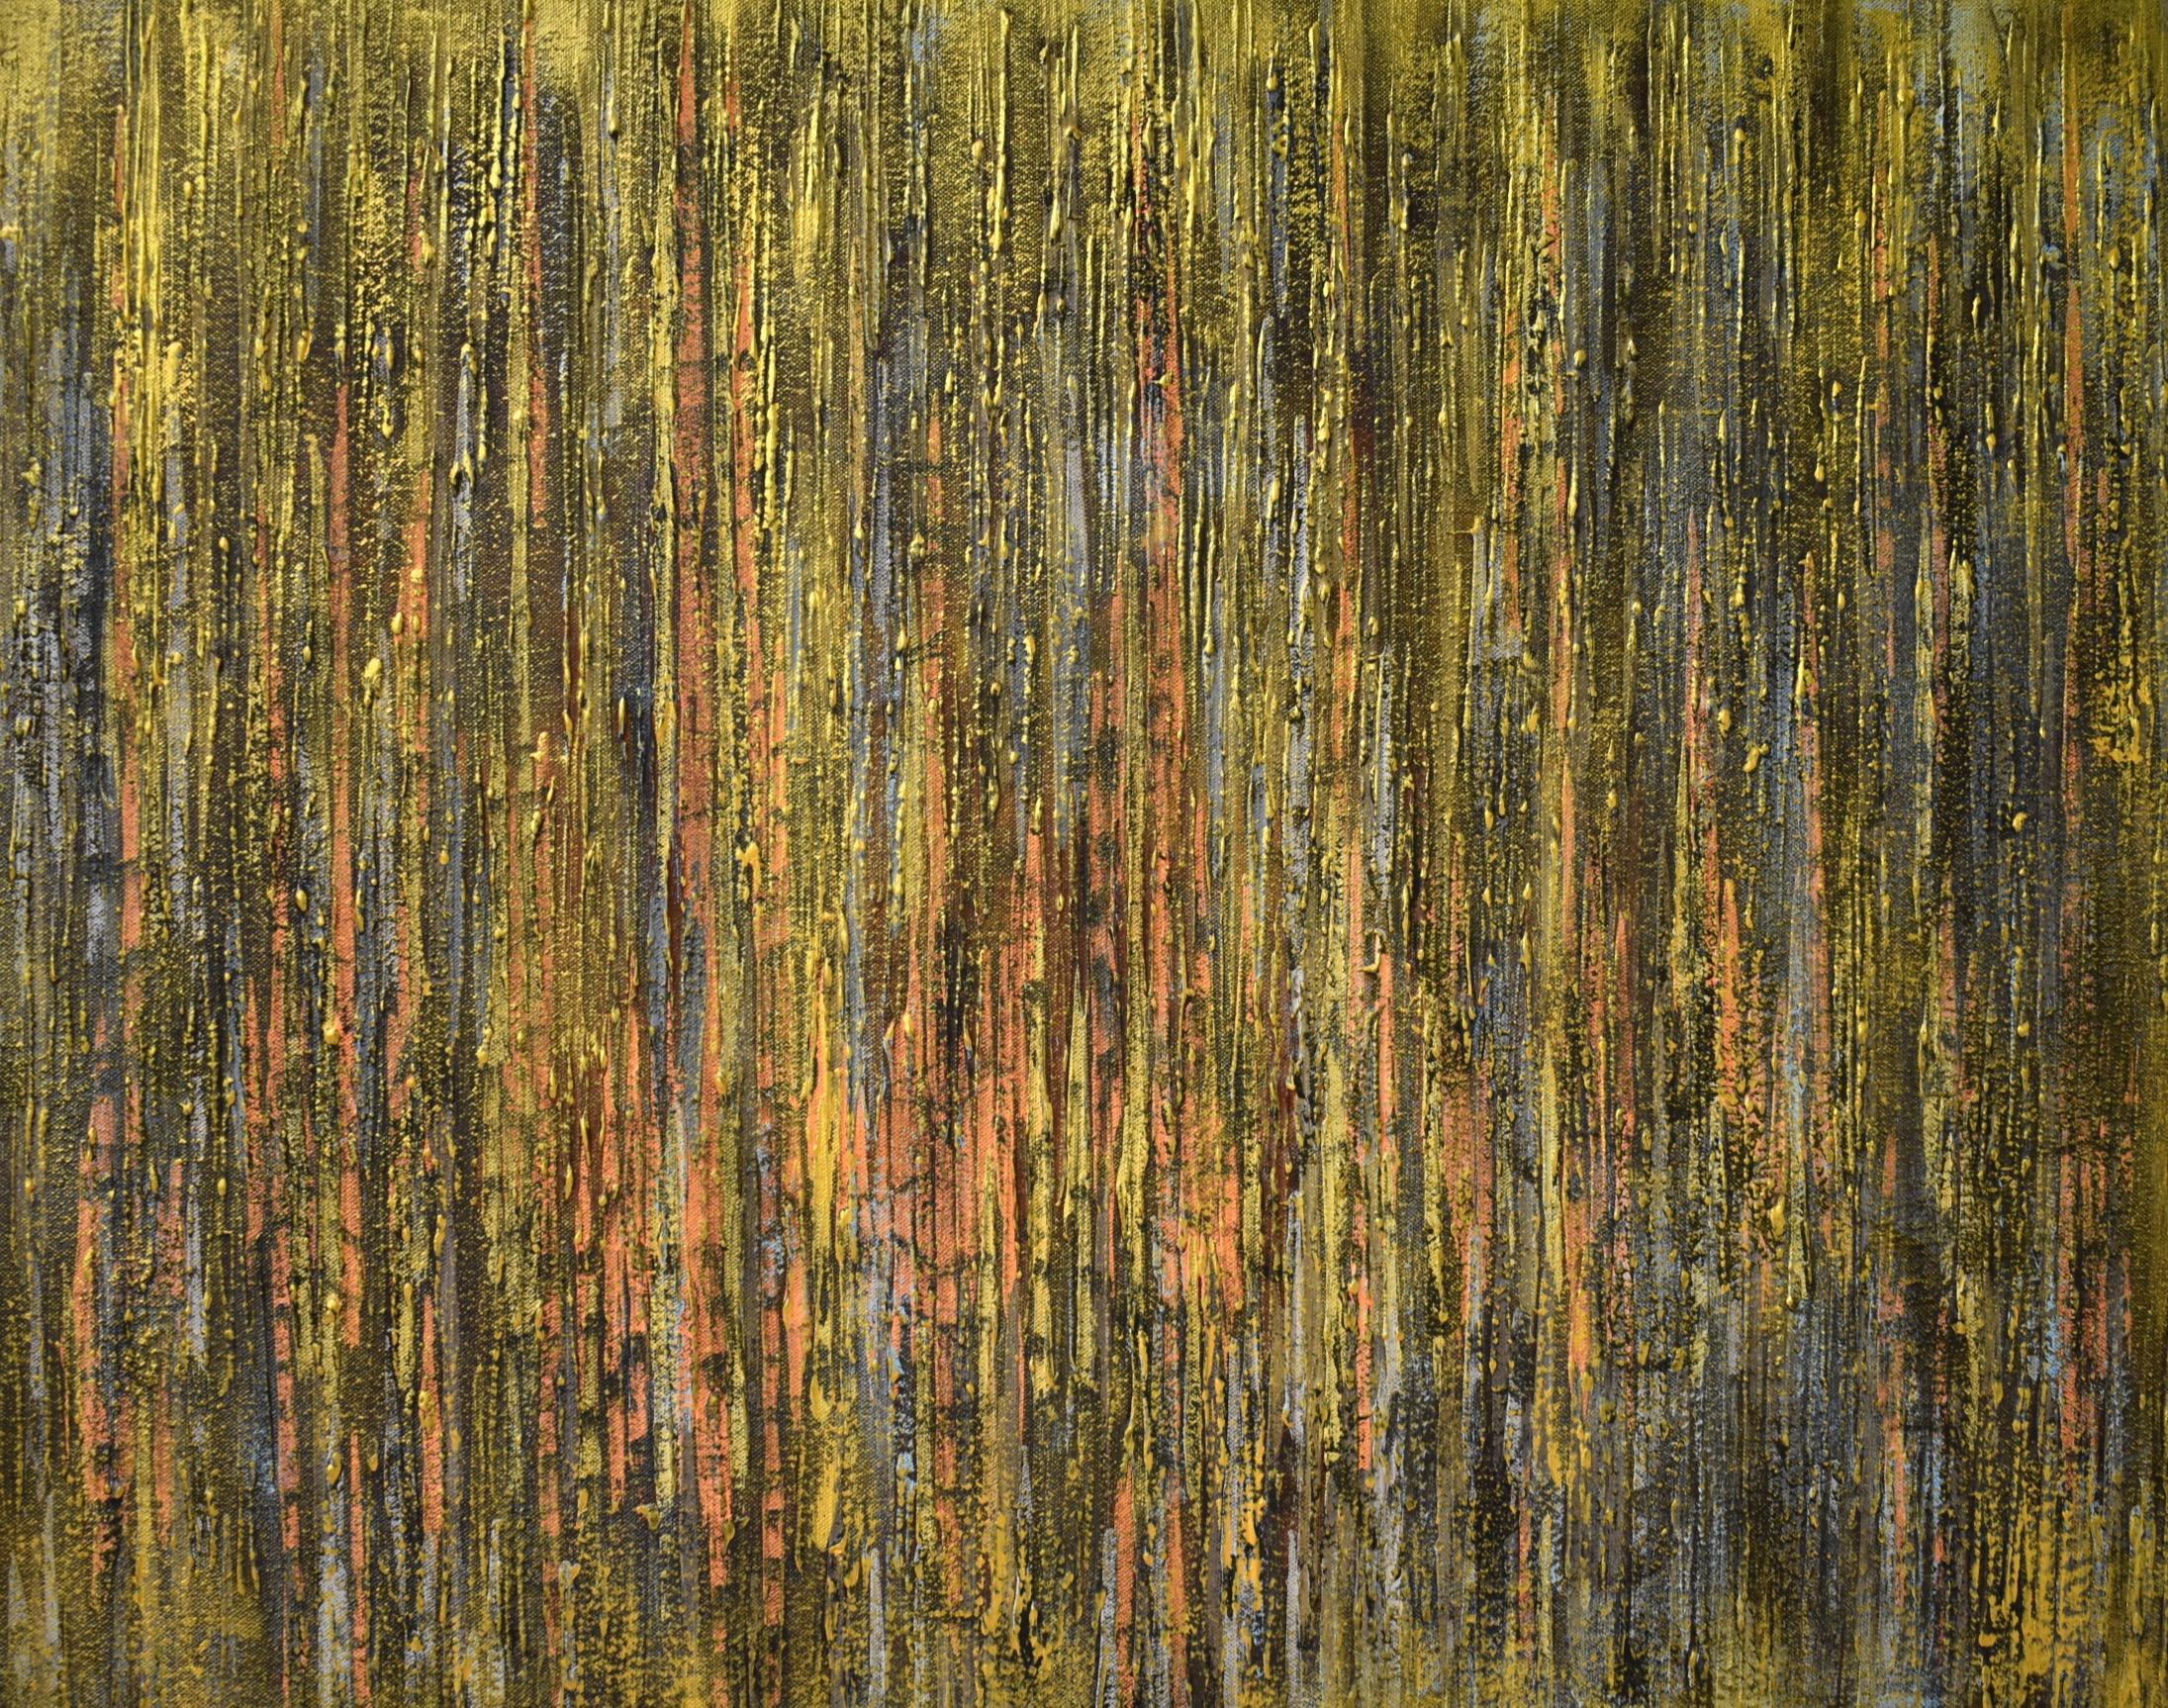 76x61cm painting